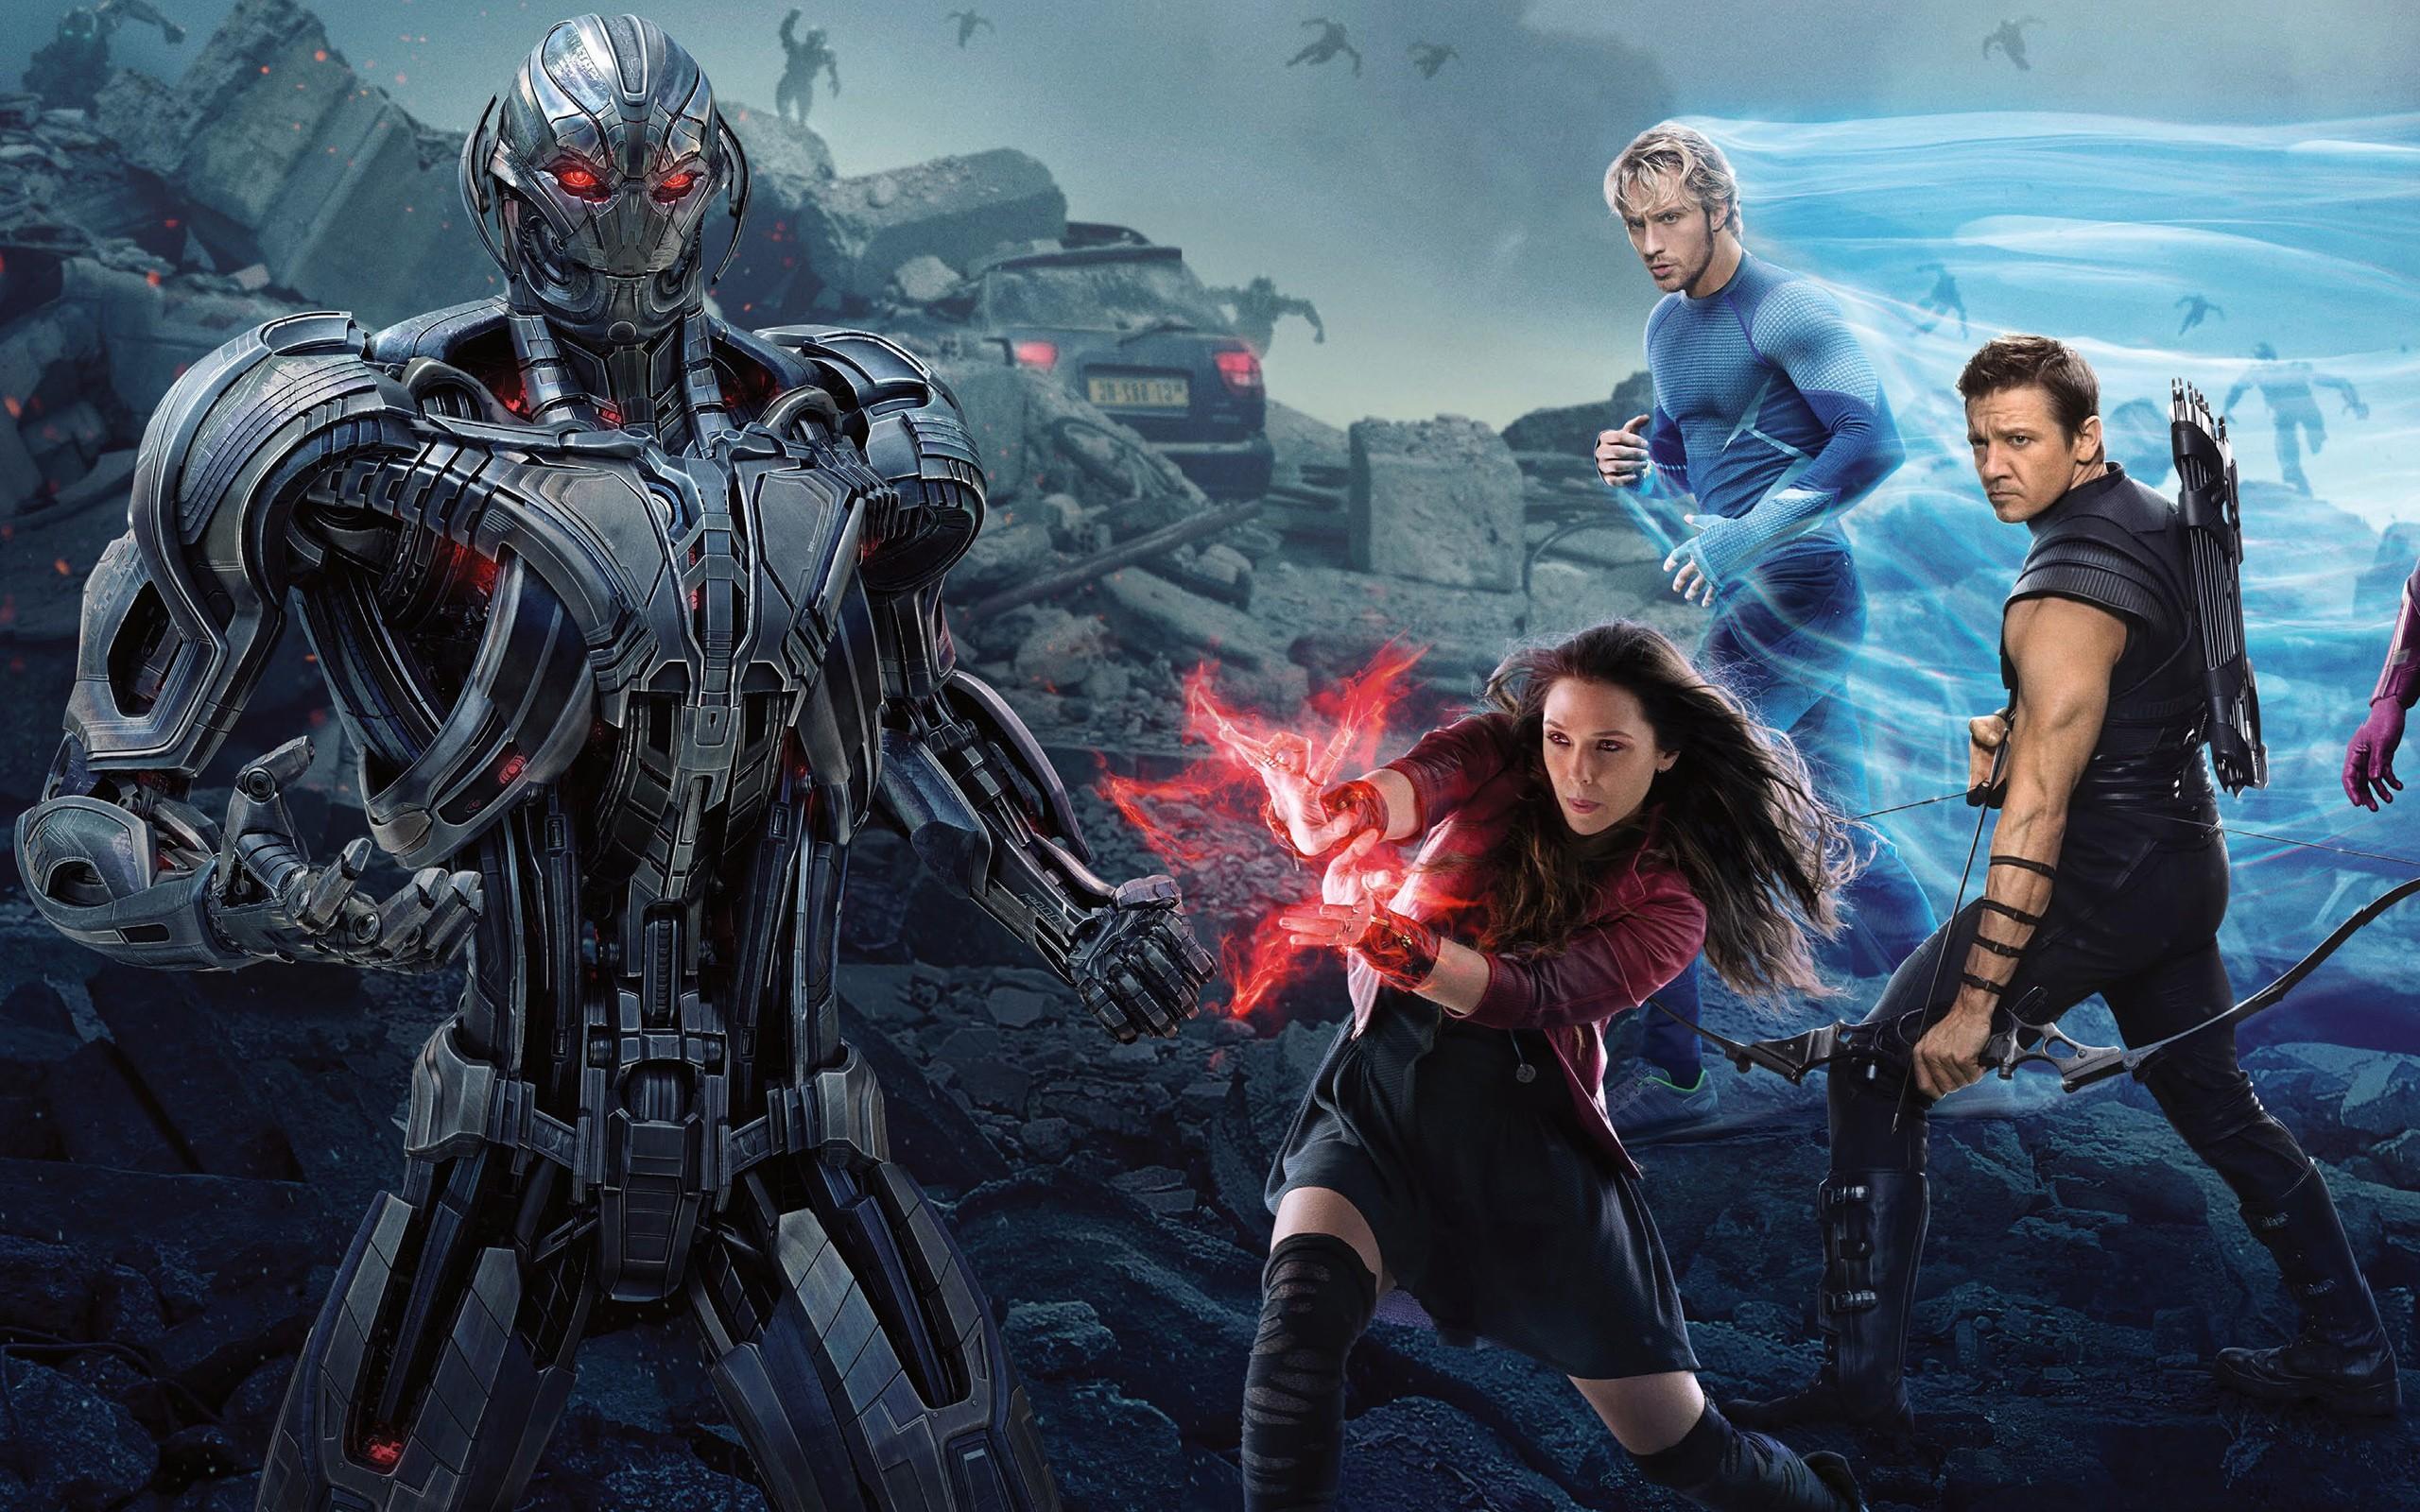 1366x768 Avengers 2 Age Of Ultron 1366x768 Resolution Hd 4k